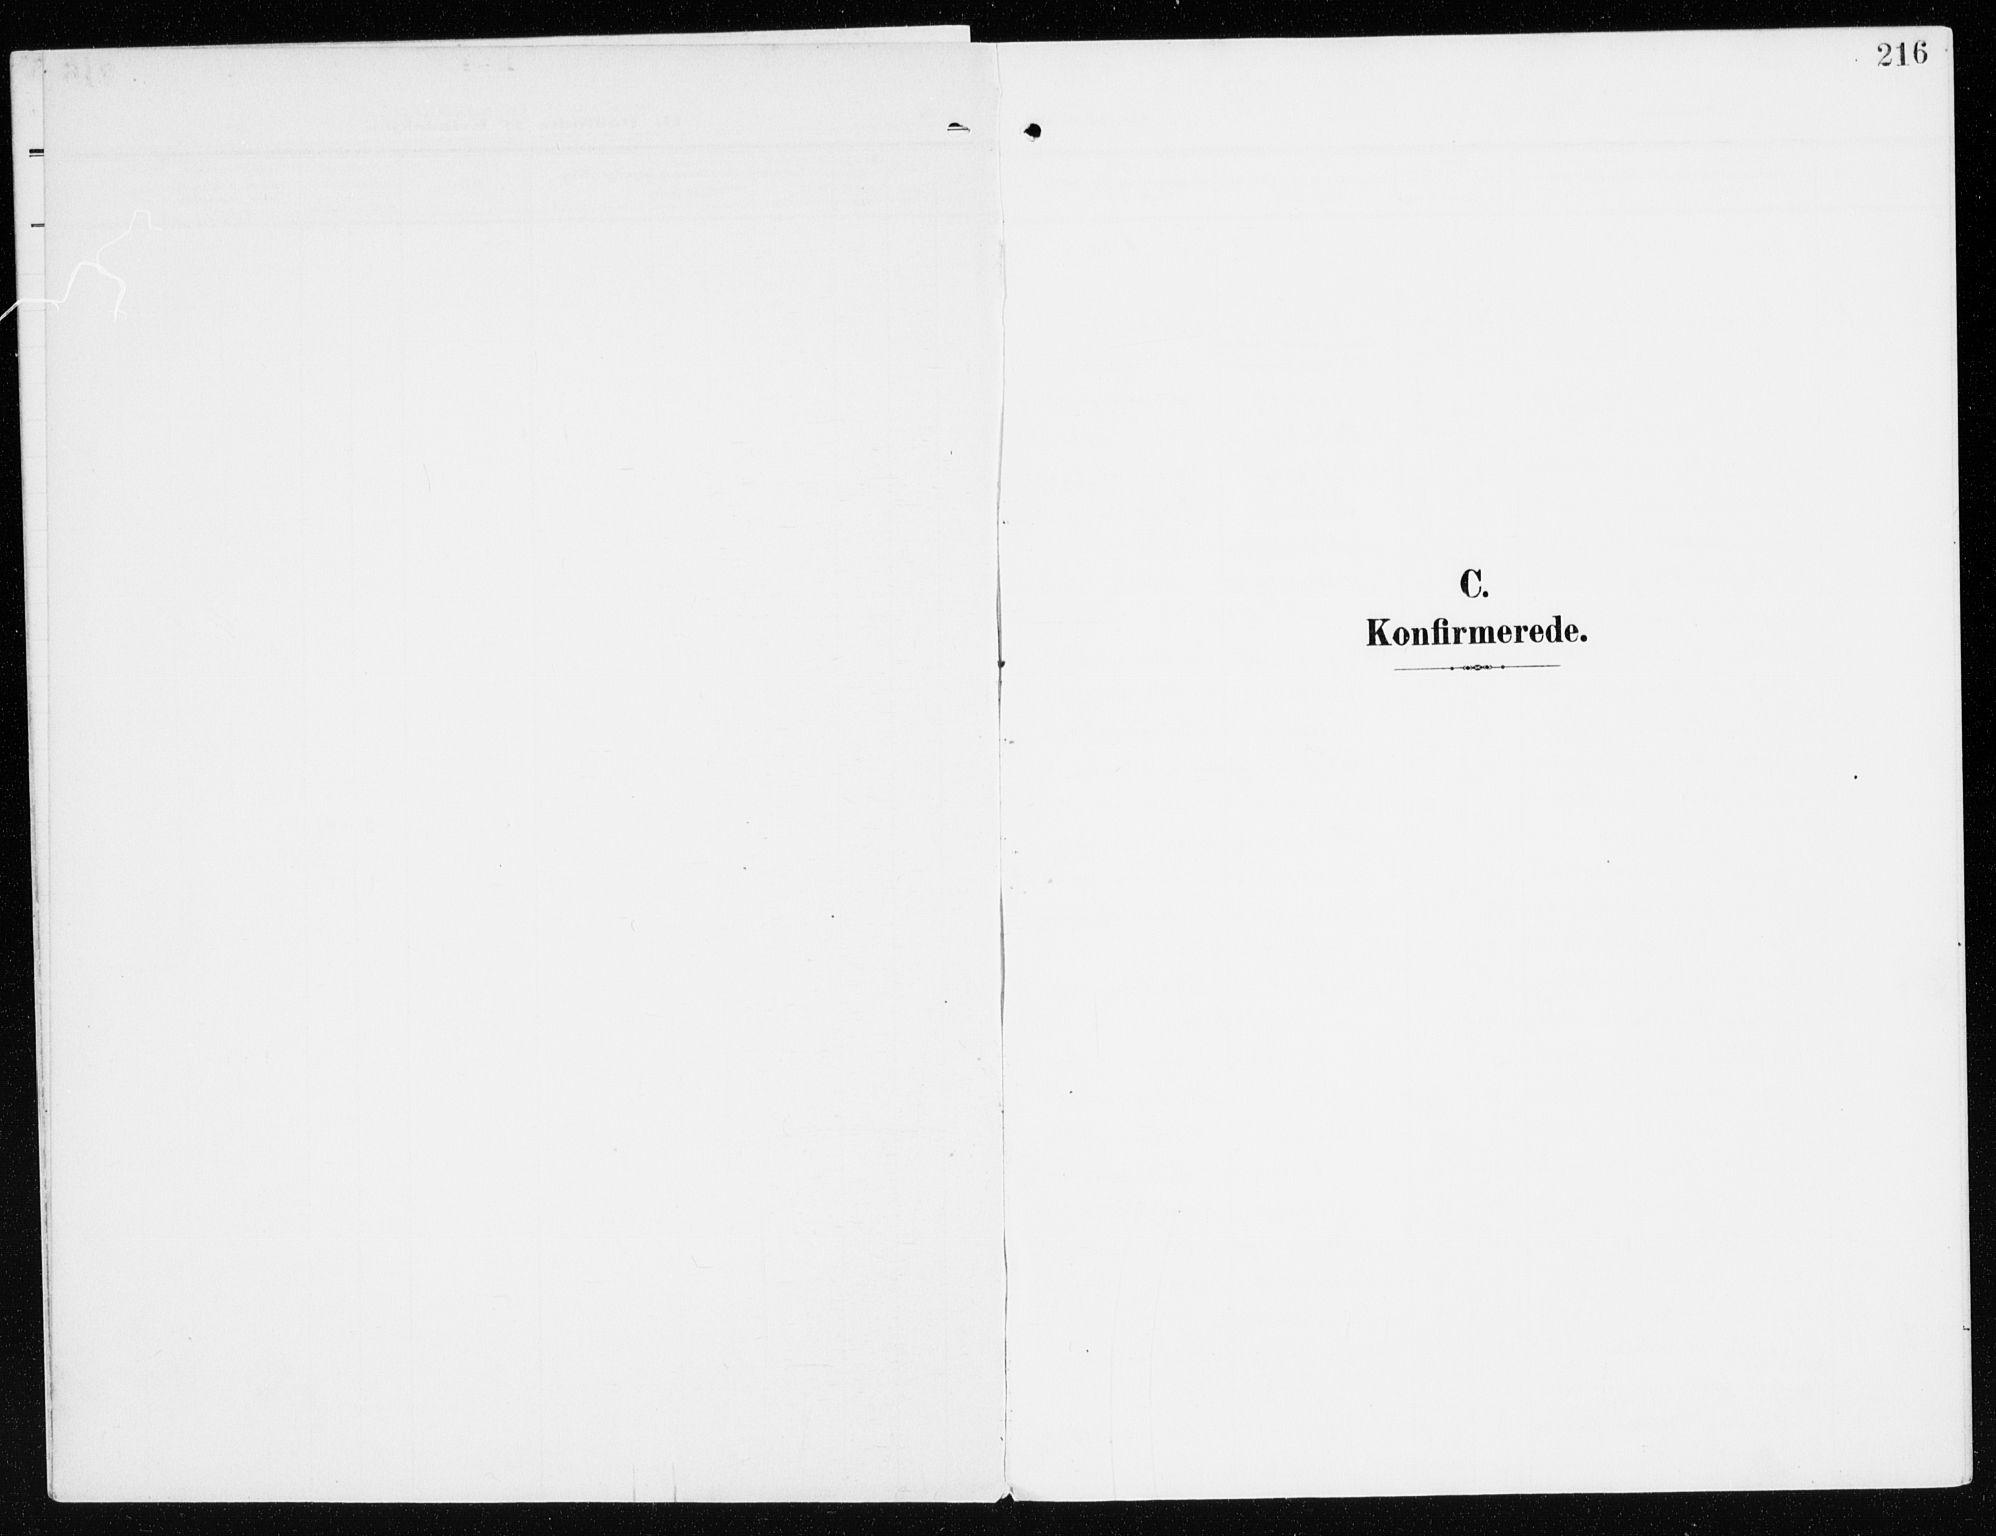 SAH, Furnes prestekontor, K/Ka/L0001: Ministerialbok nr. 1, 1907-1935, s. 216